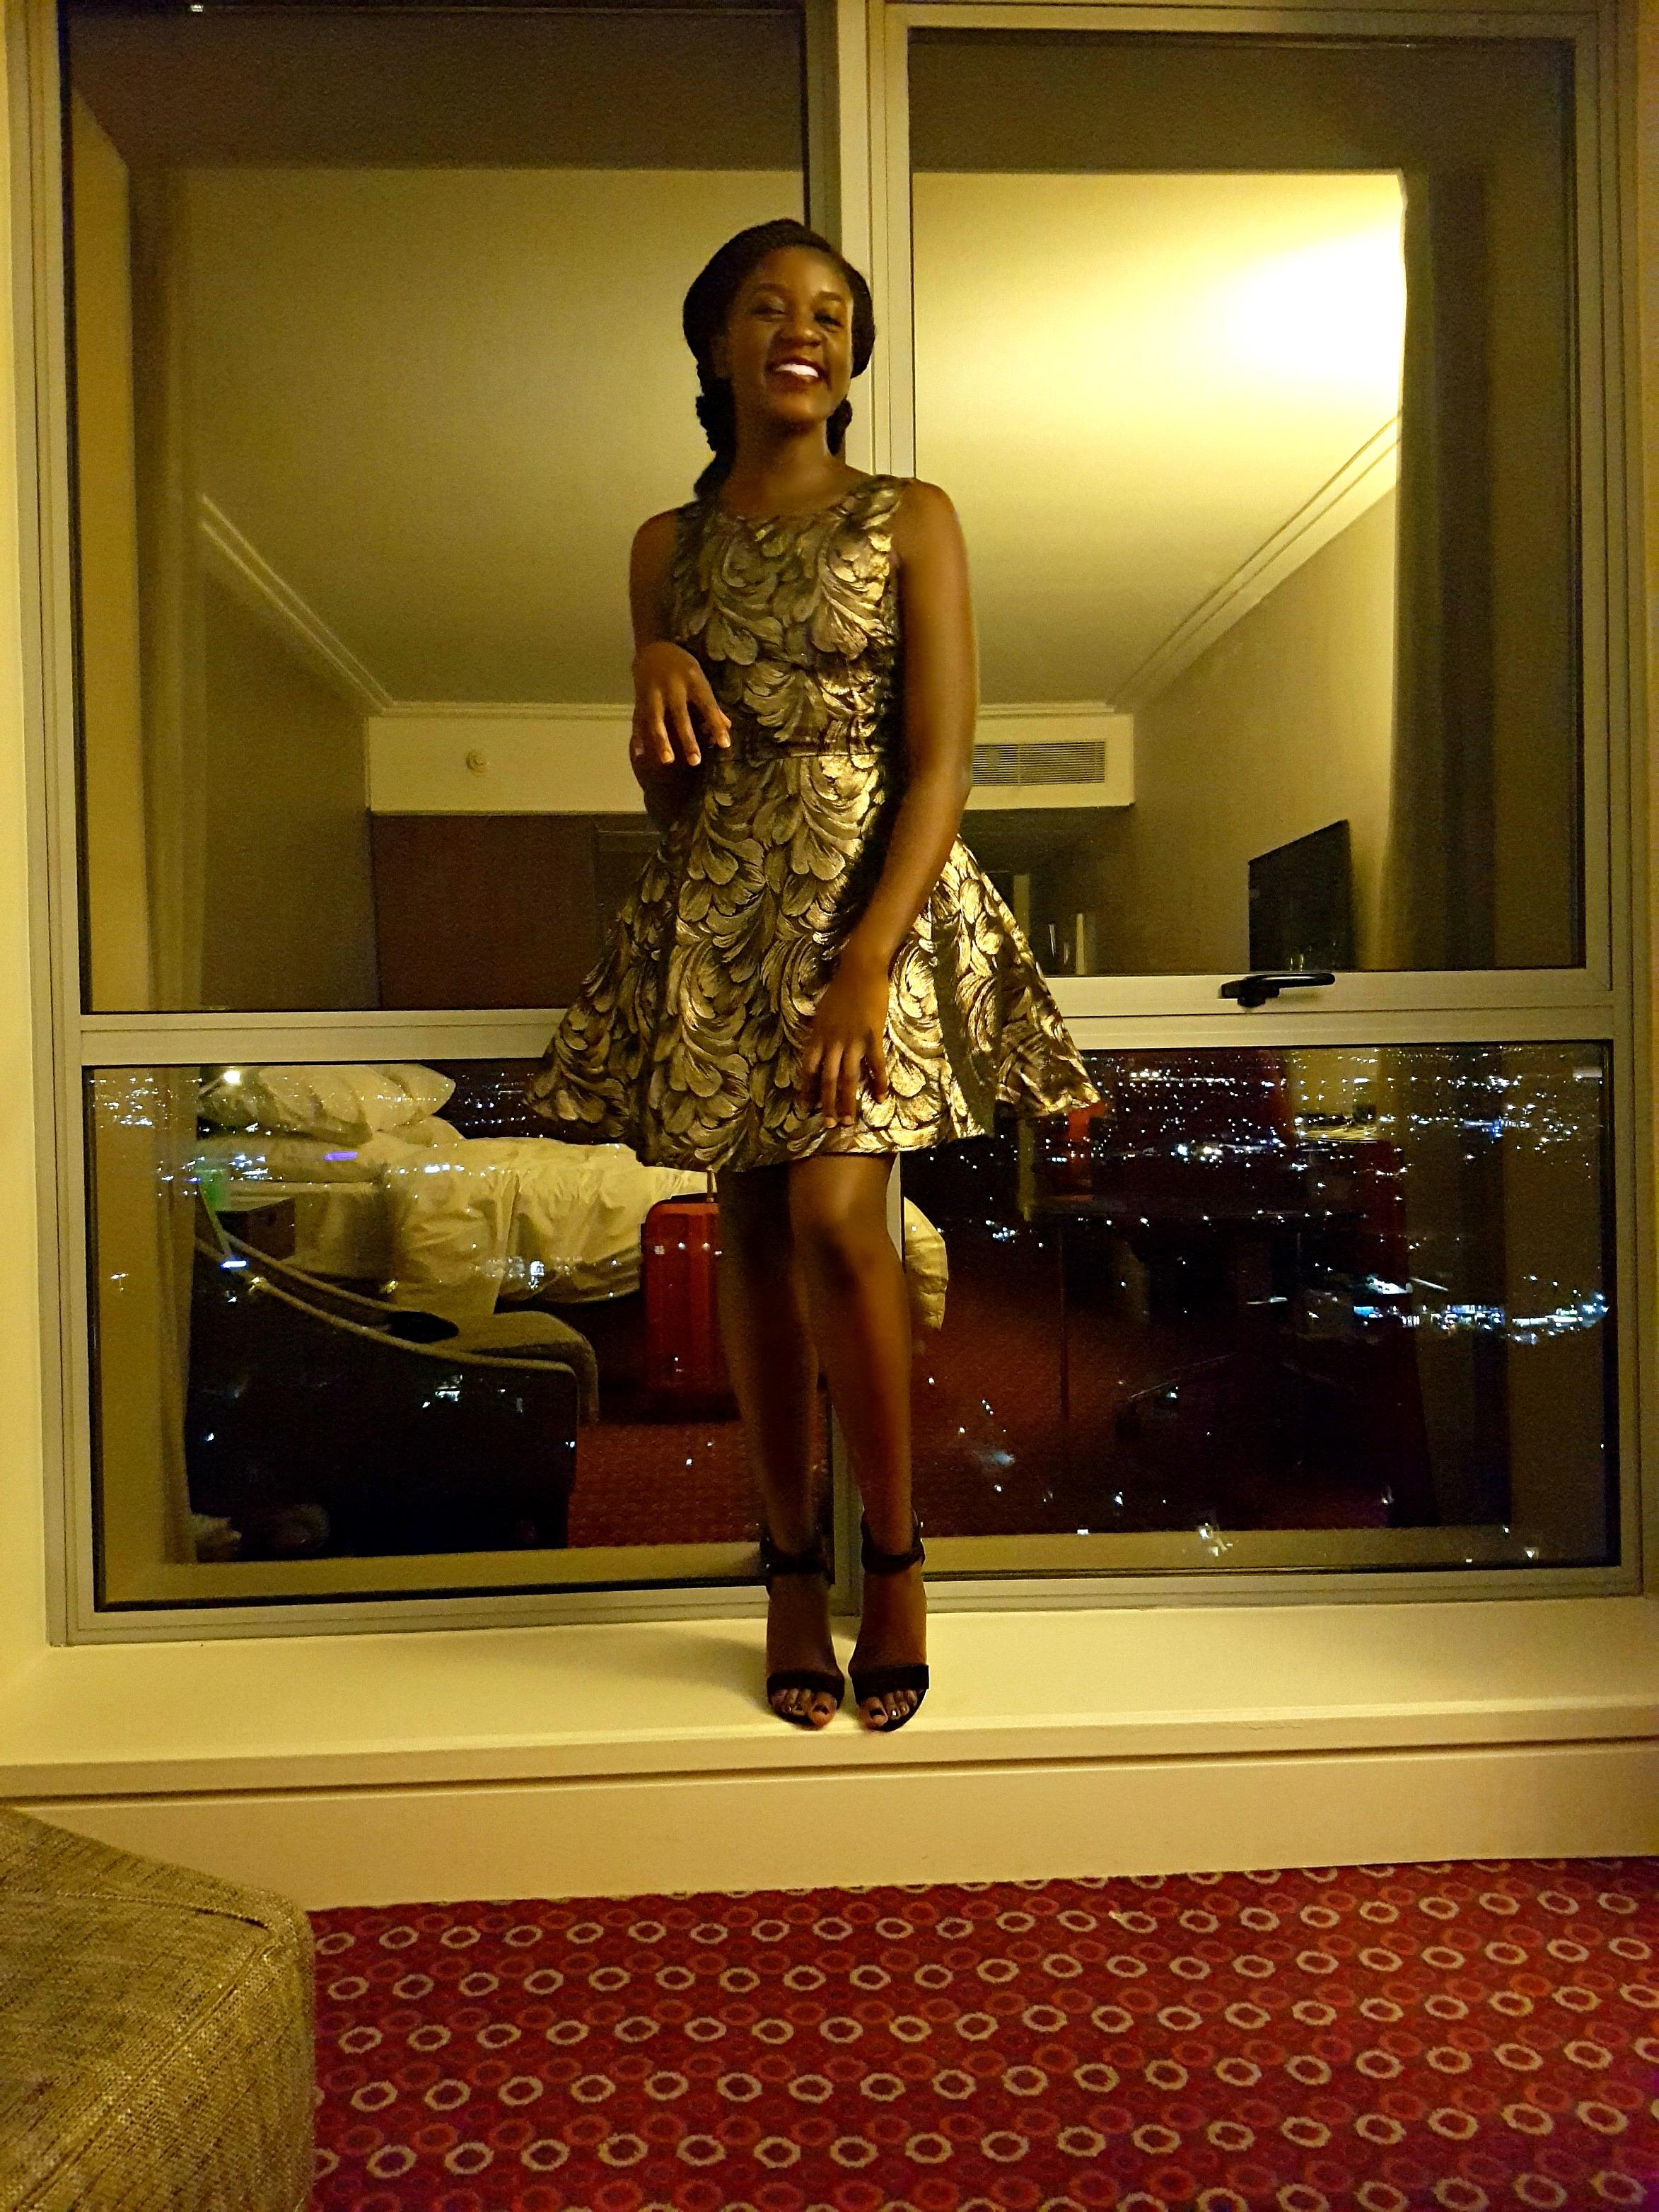 kaluhi_kaluhi-adagala_top-african-food-bloggers_top-kenyan-food-bloggers_johannesburg-you-tube-awards-joziwithgoogle_kaluhiskitchen-com